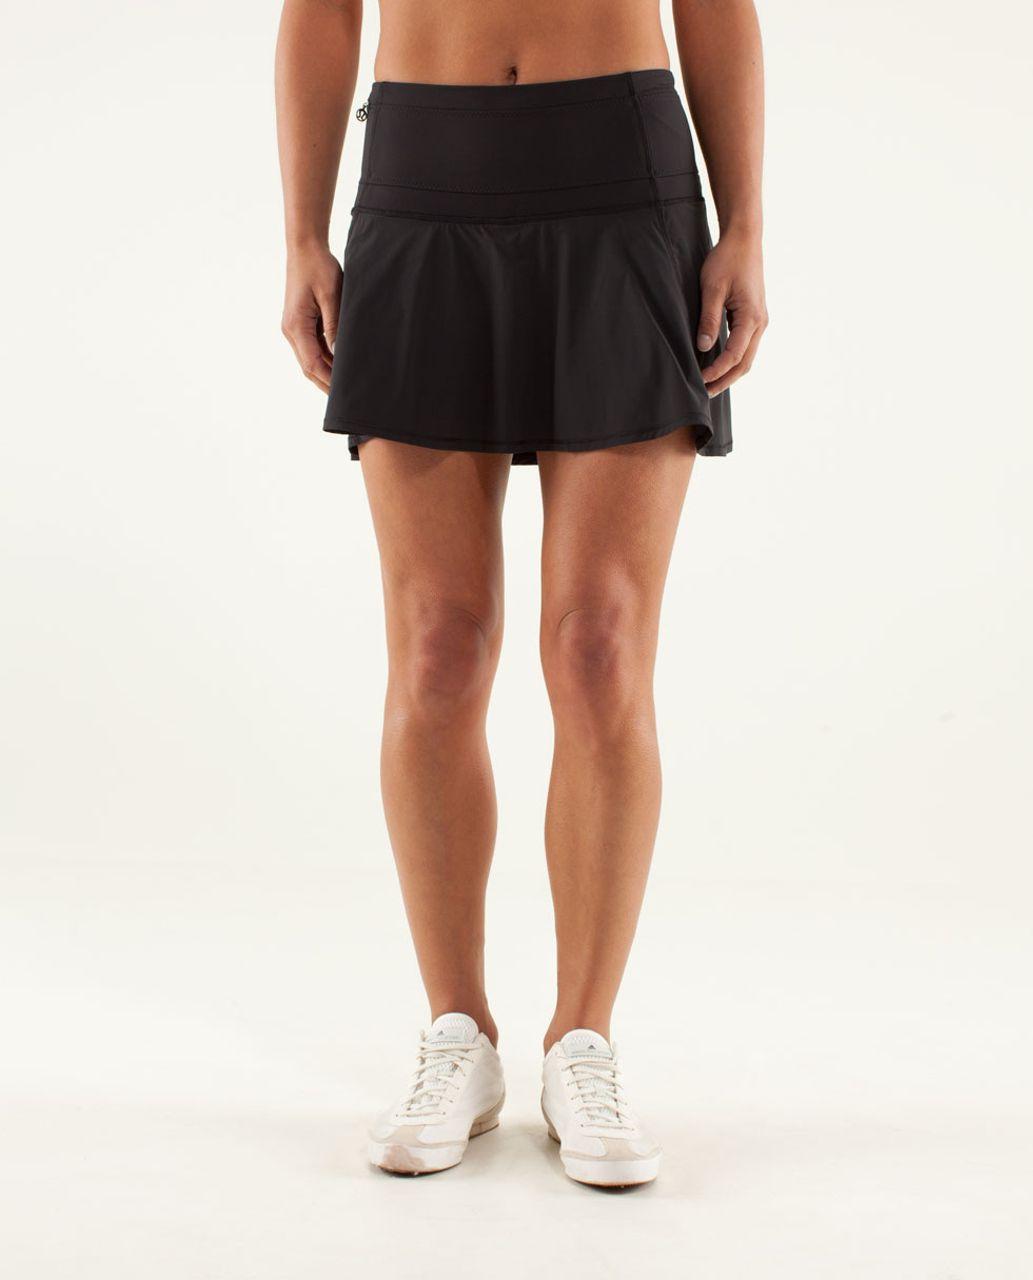 ae9d26c9ae Lululemon Hot Hitter Skirt - Black - lulu fanatics